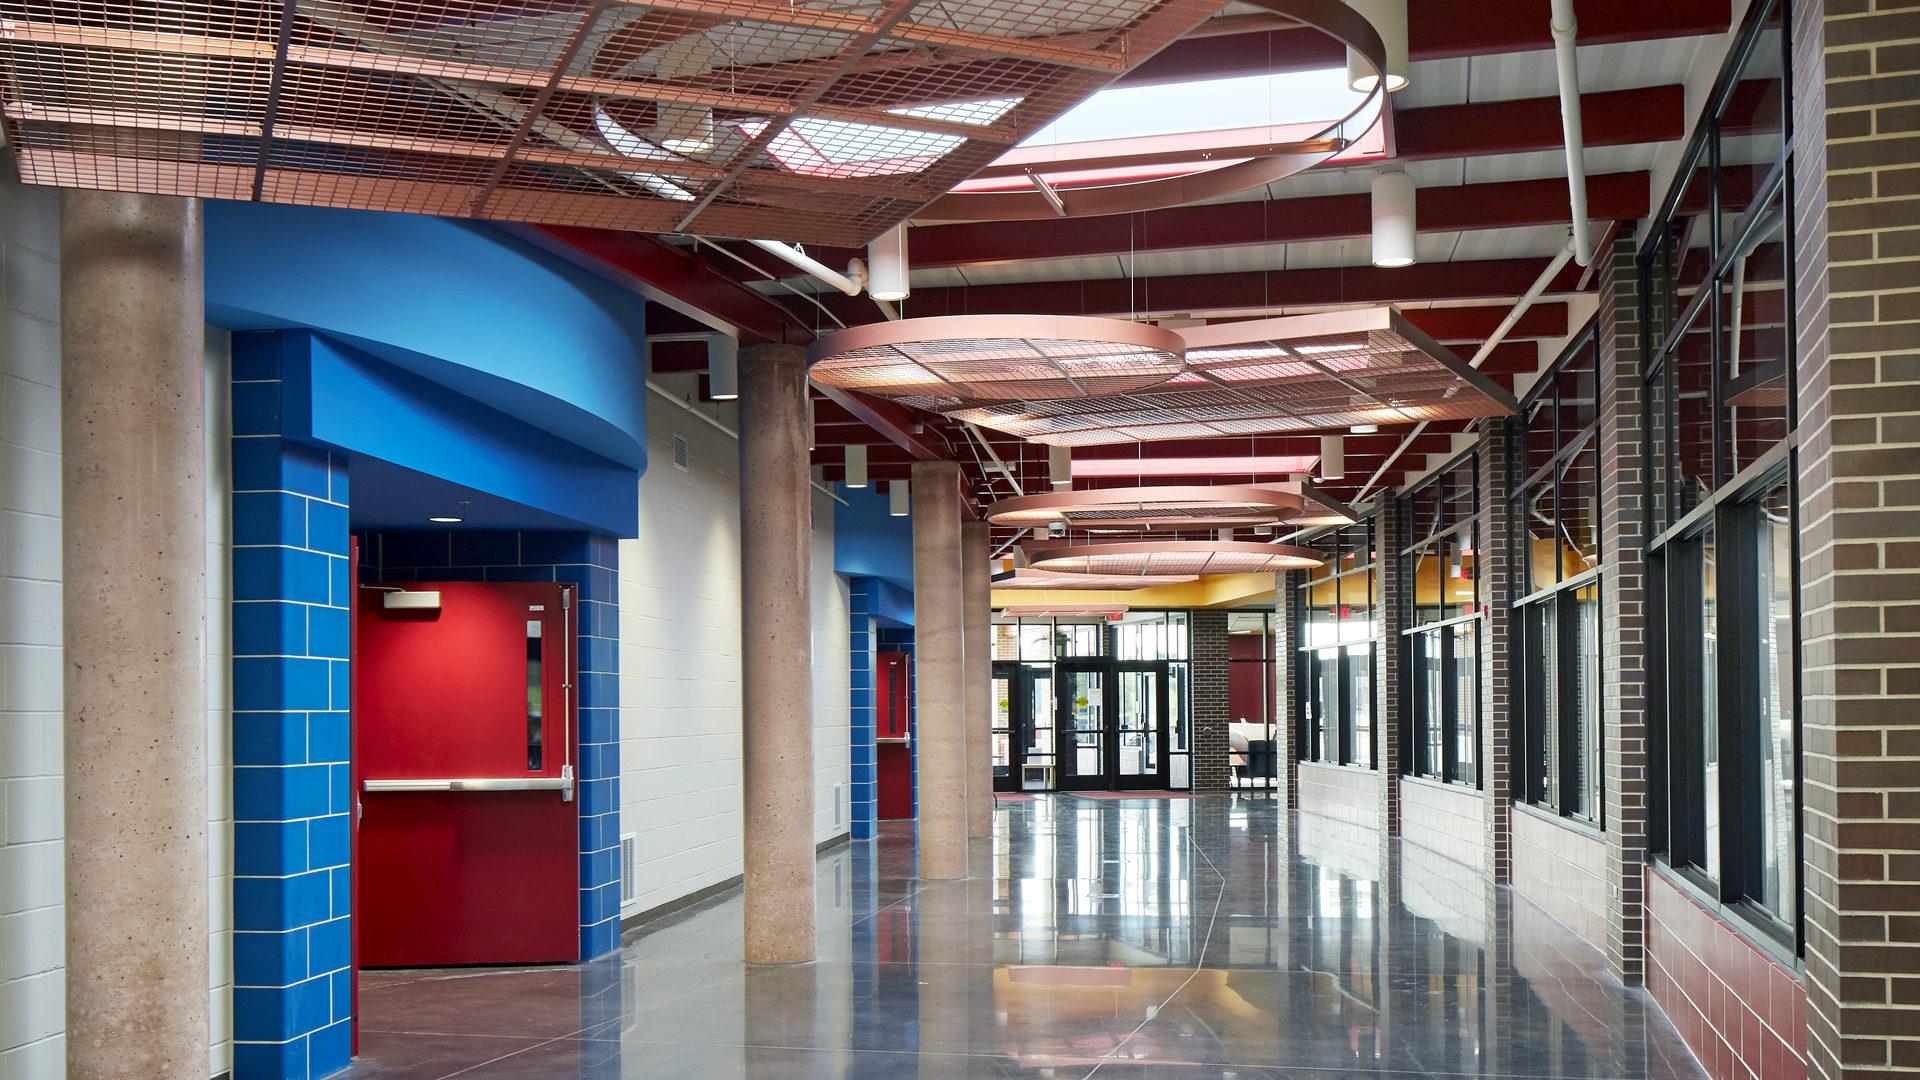 Pine Island Elementary School Pine Island MN Interior Entrance Corridor